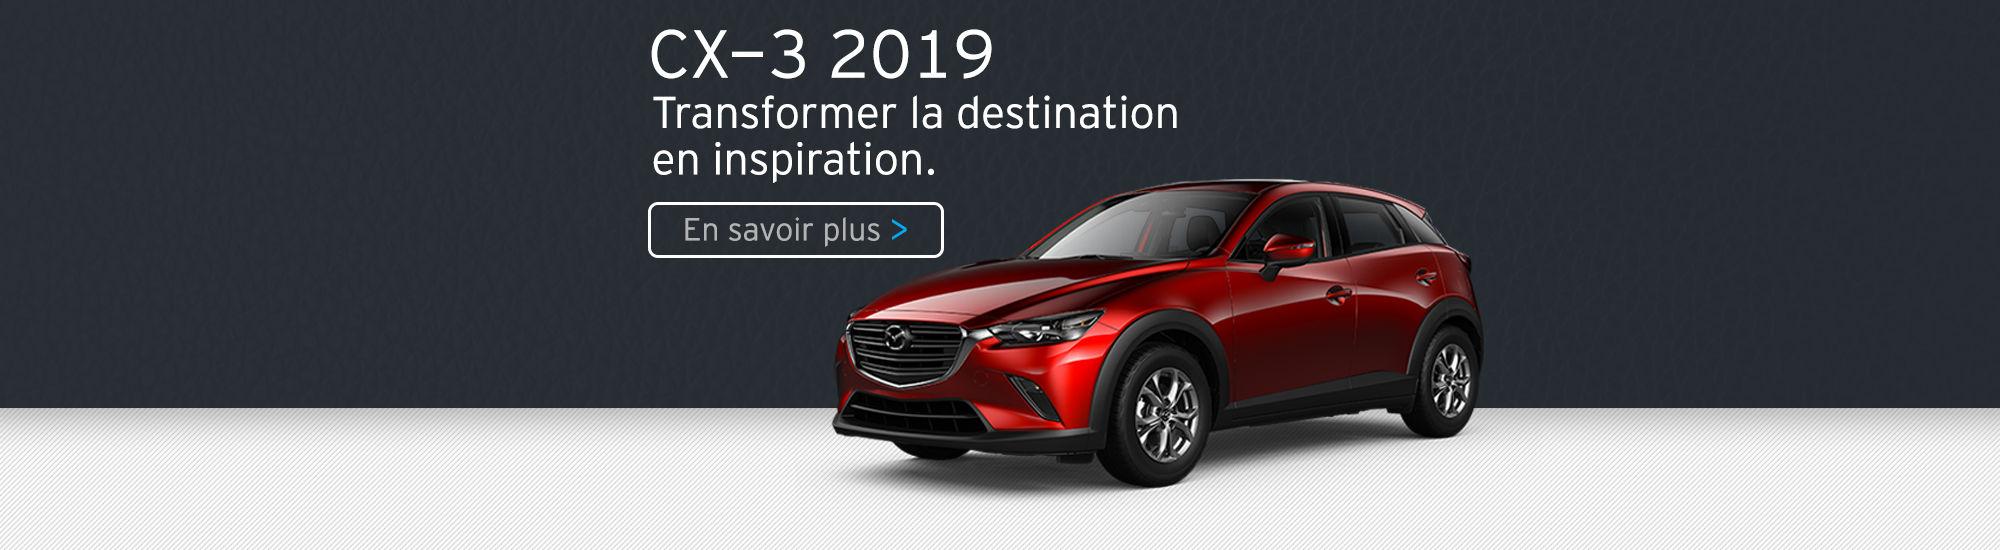 CX-3 2019